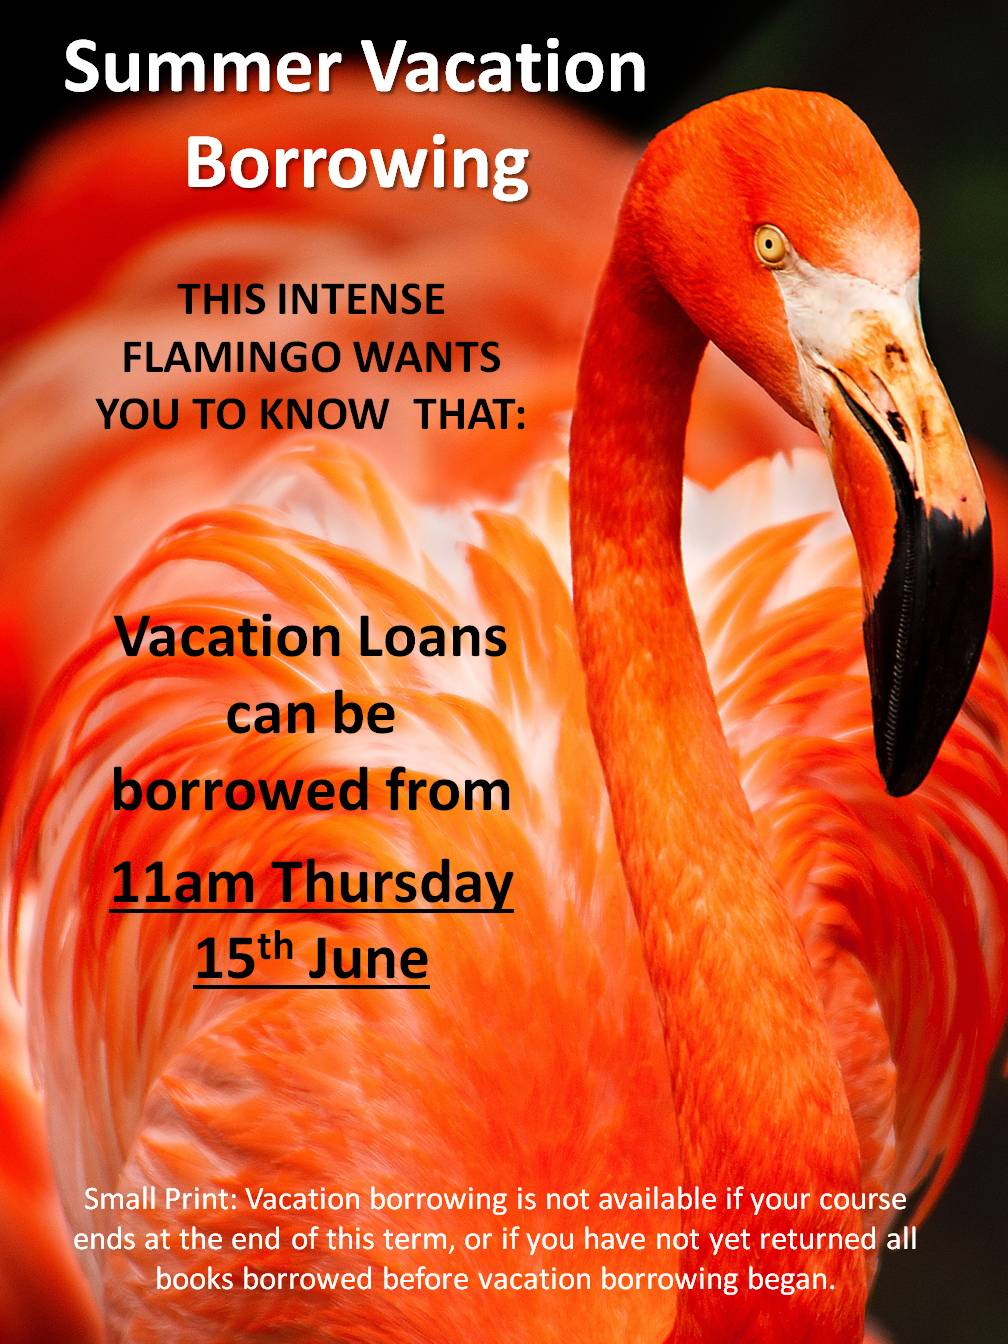 Summer Vacation Borrowing